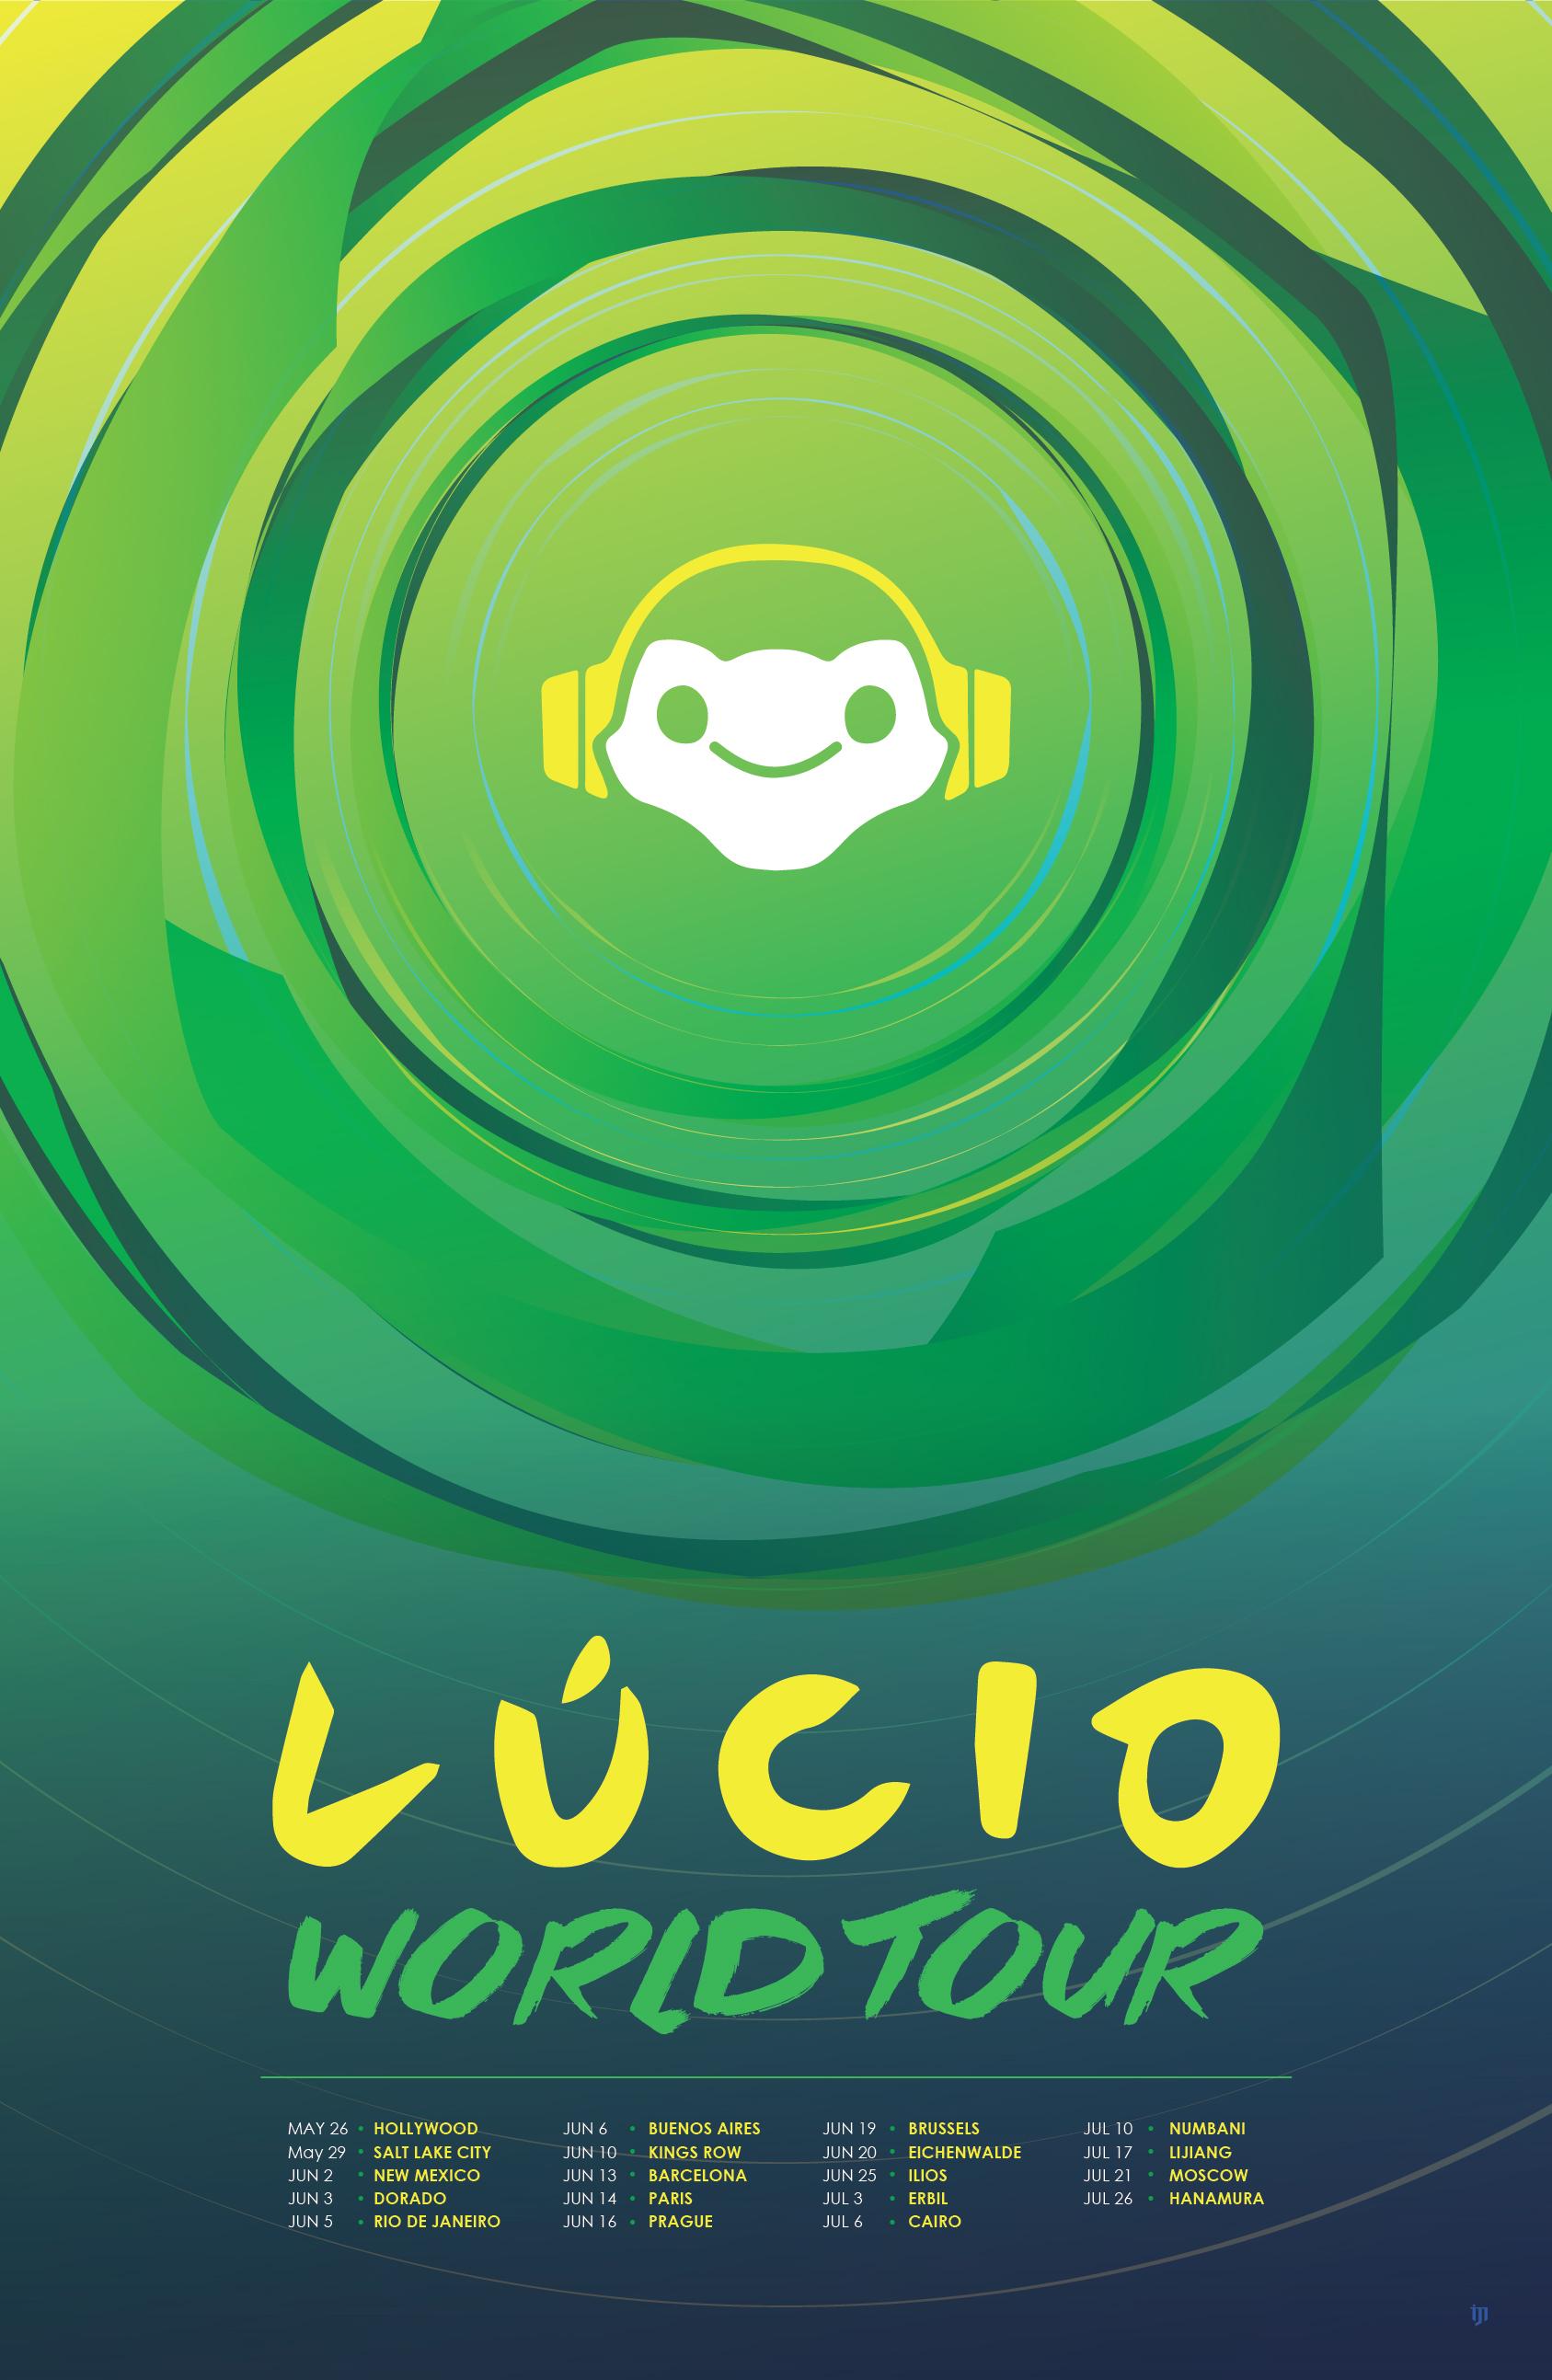 Lucio_World_Tour_Web_Final.jpg